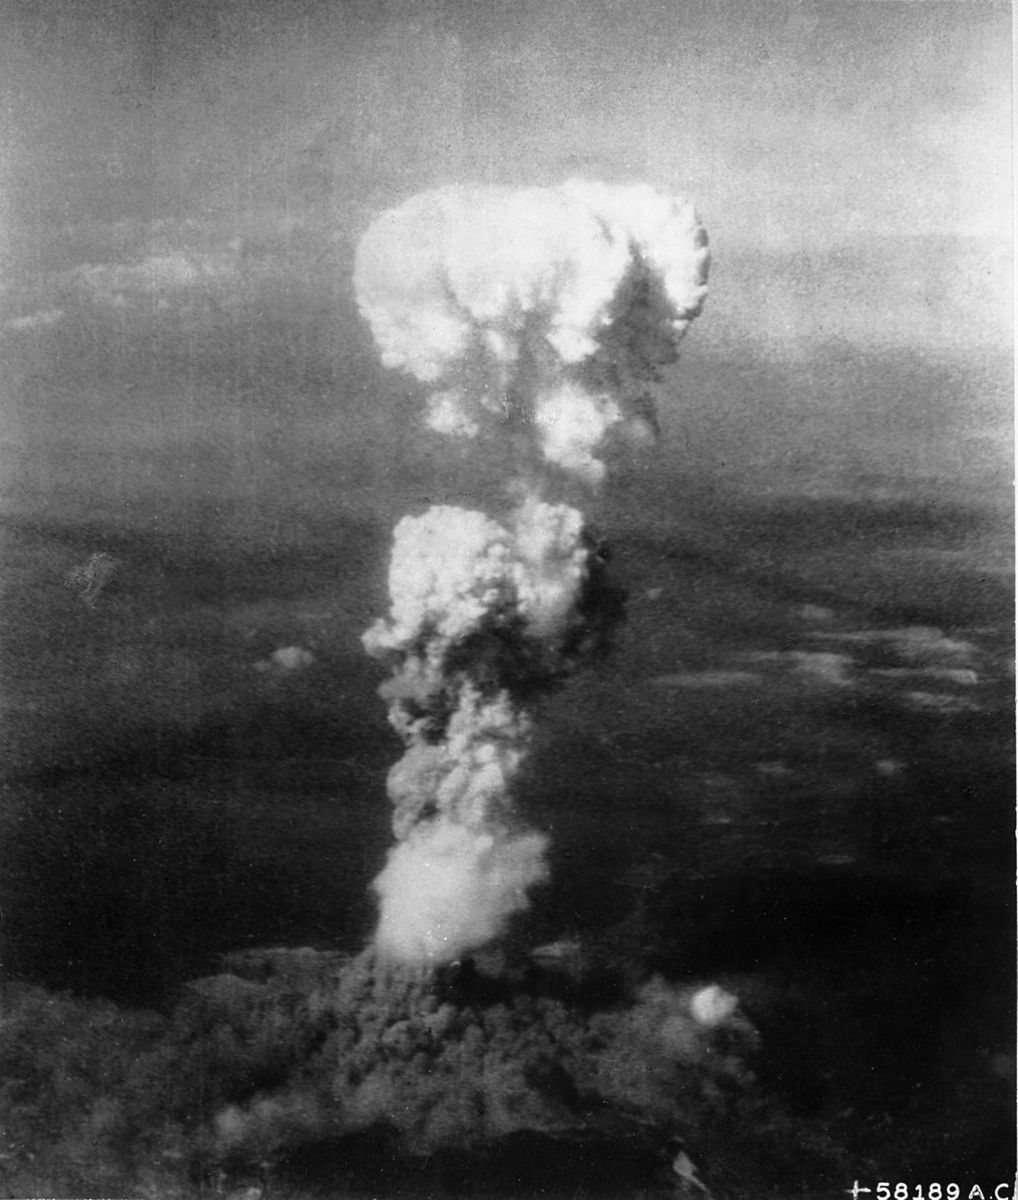 Atomic bomb over Hiroshima, Japan - August 6, 1945